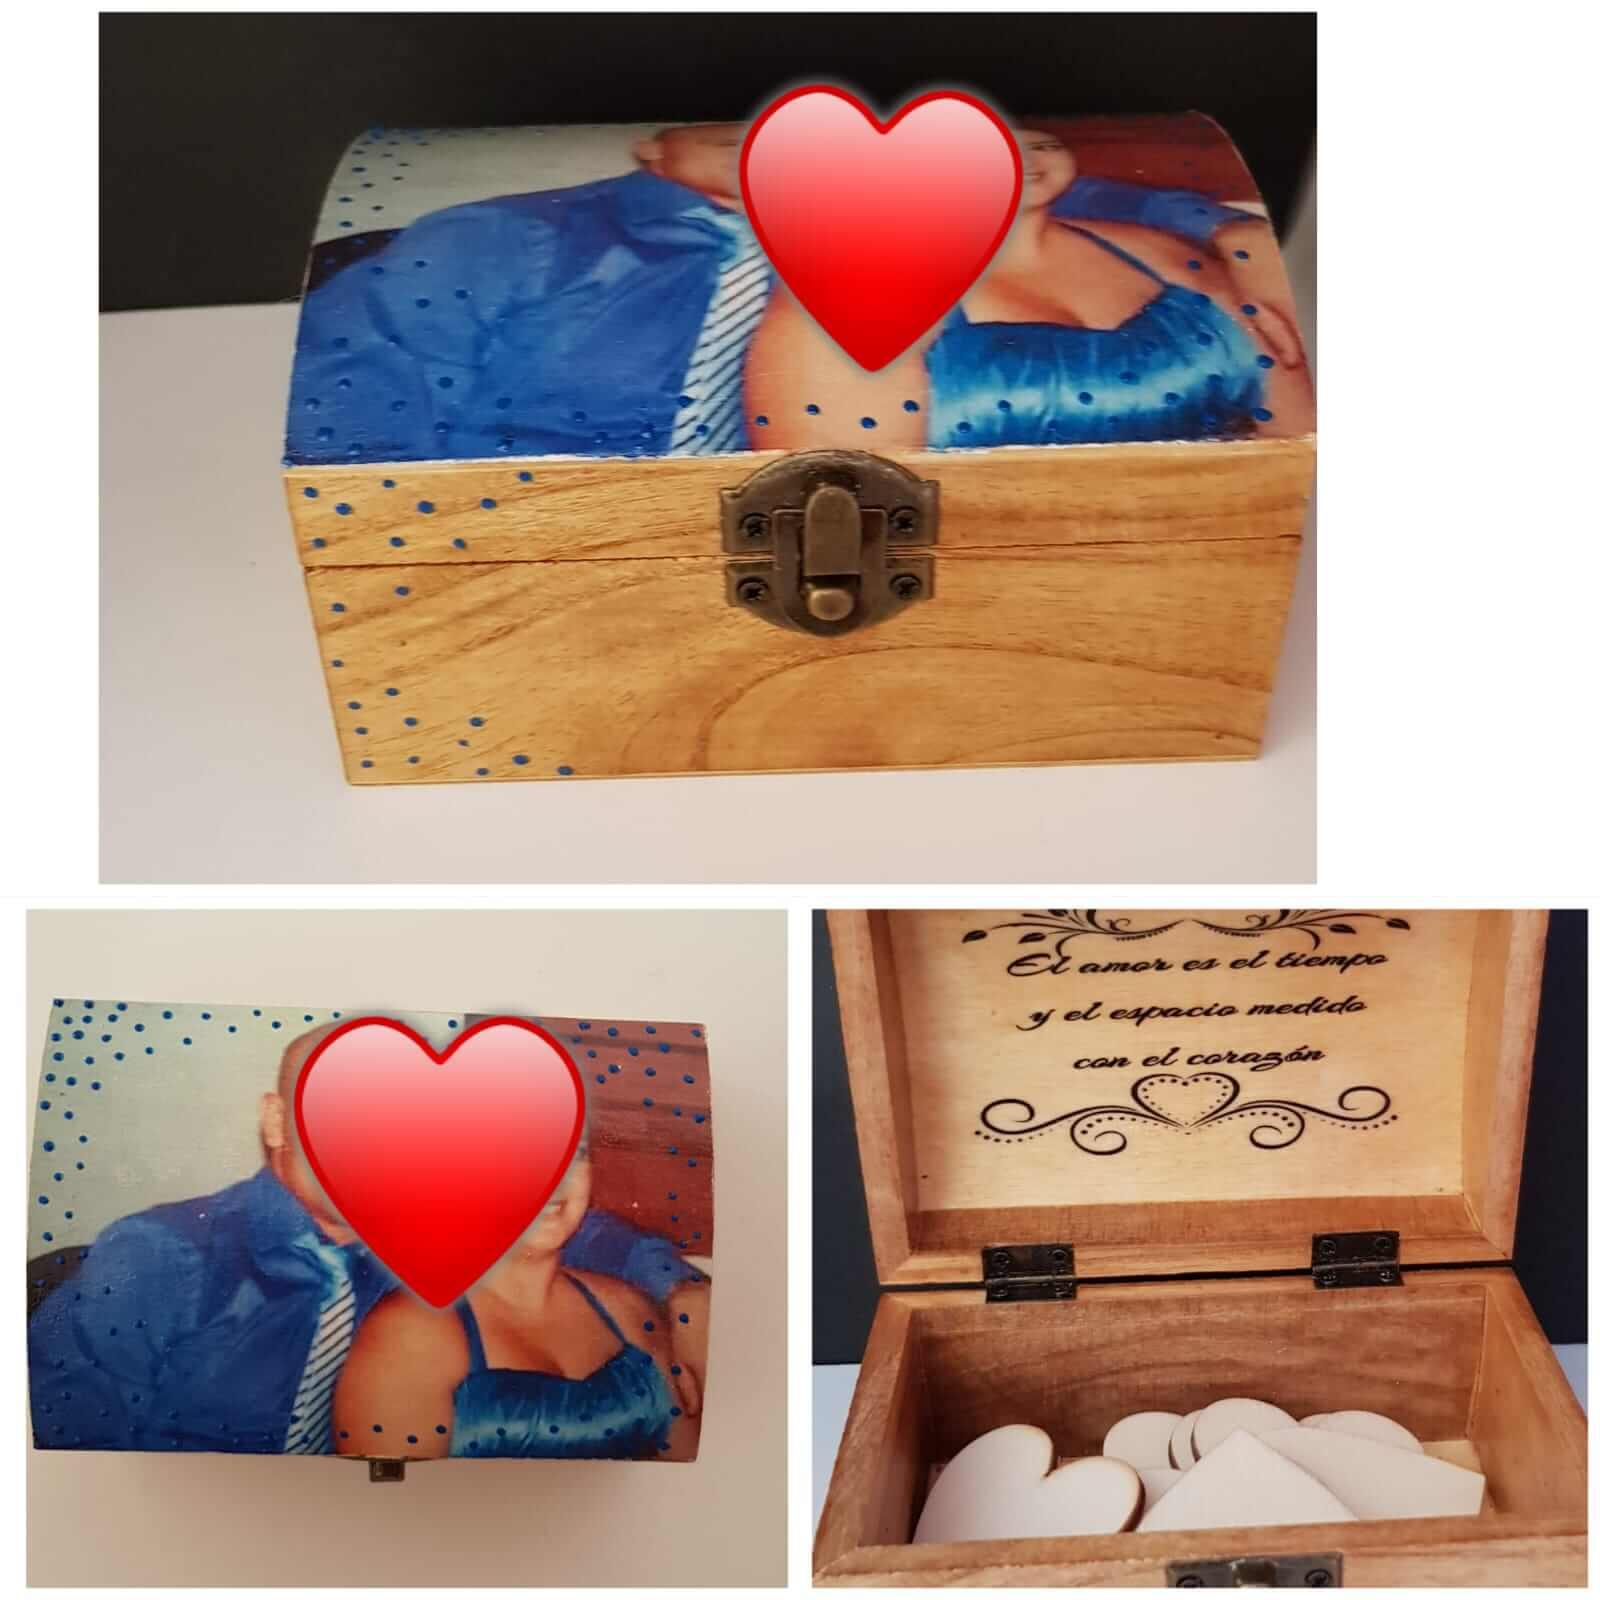 Caja de madera para libro de firmas caja de madera para libro de firmas - Caja de madera para libro de firmas 1 - Caja de madera para libro de firmas